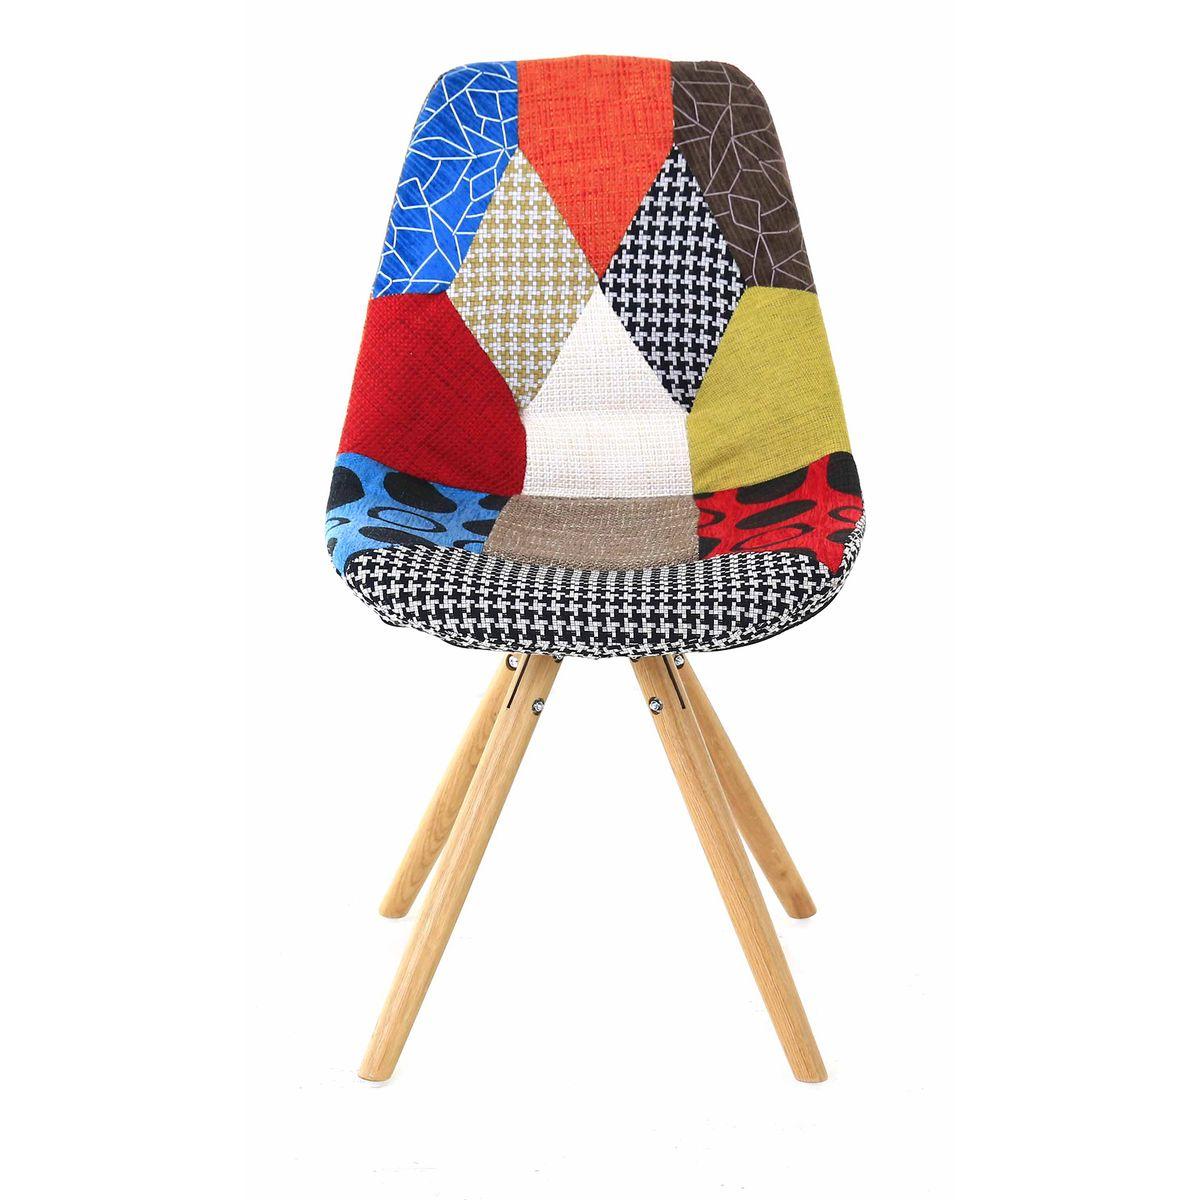 Chaise scandinave multicolore